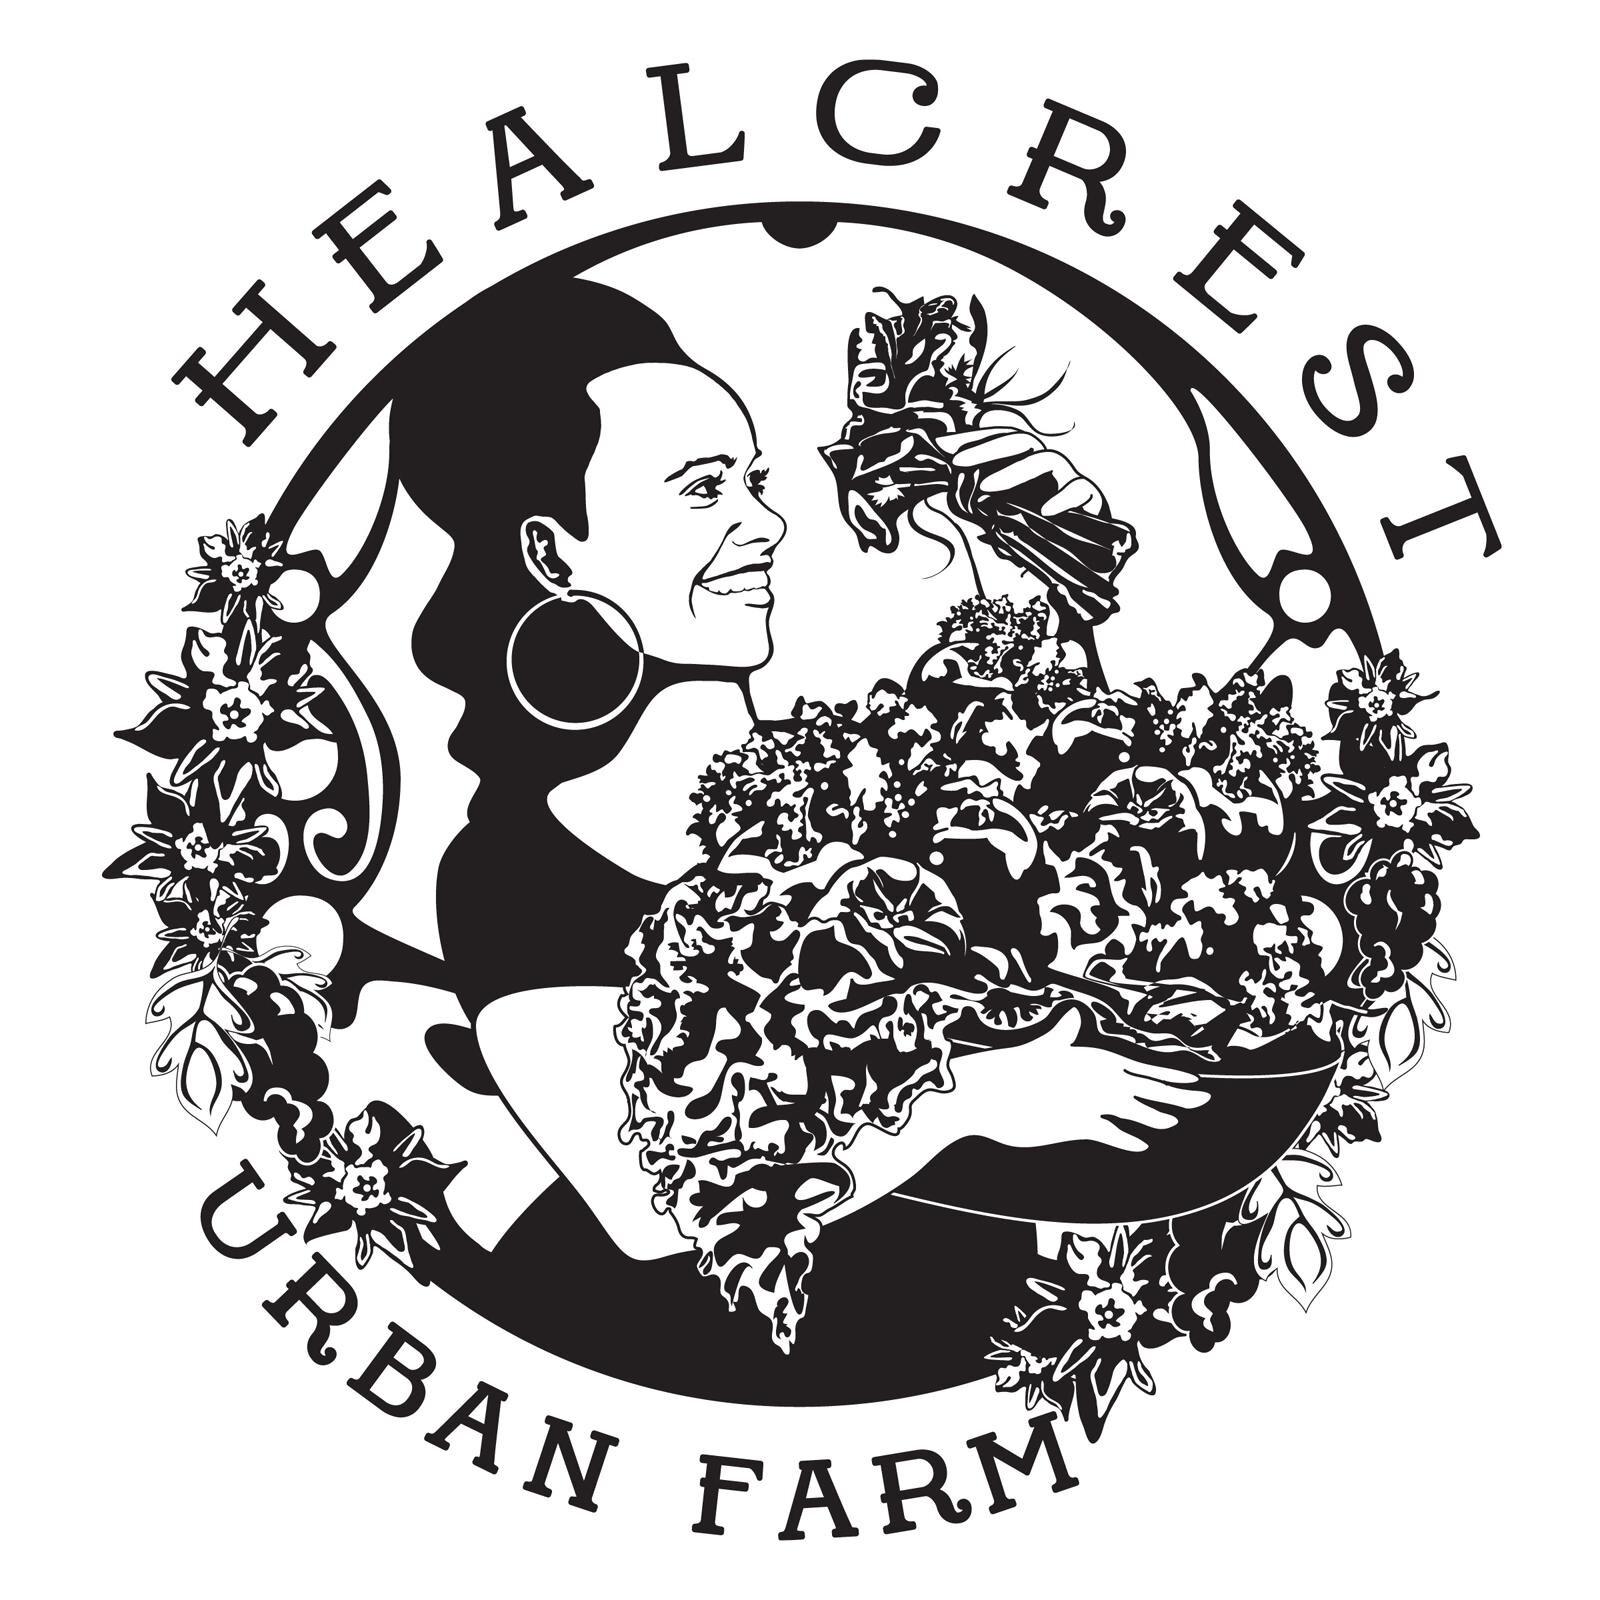 Healcrest Urban Farm